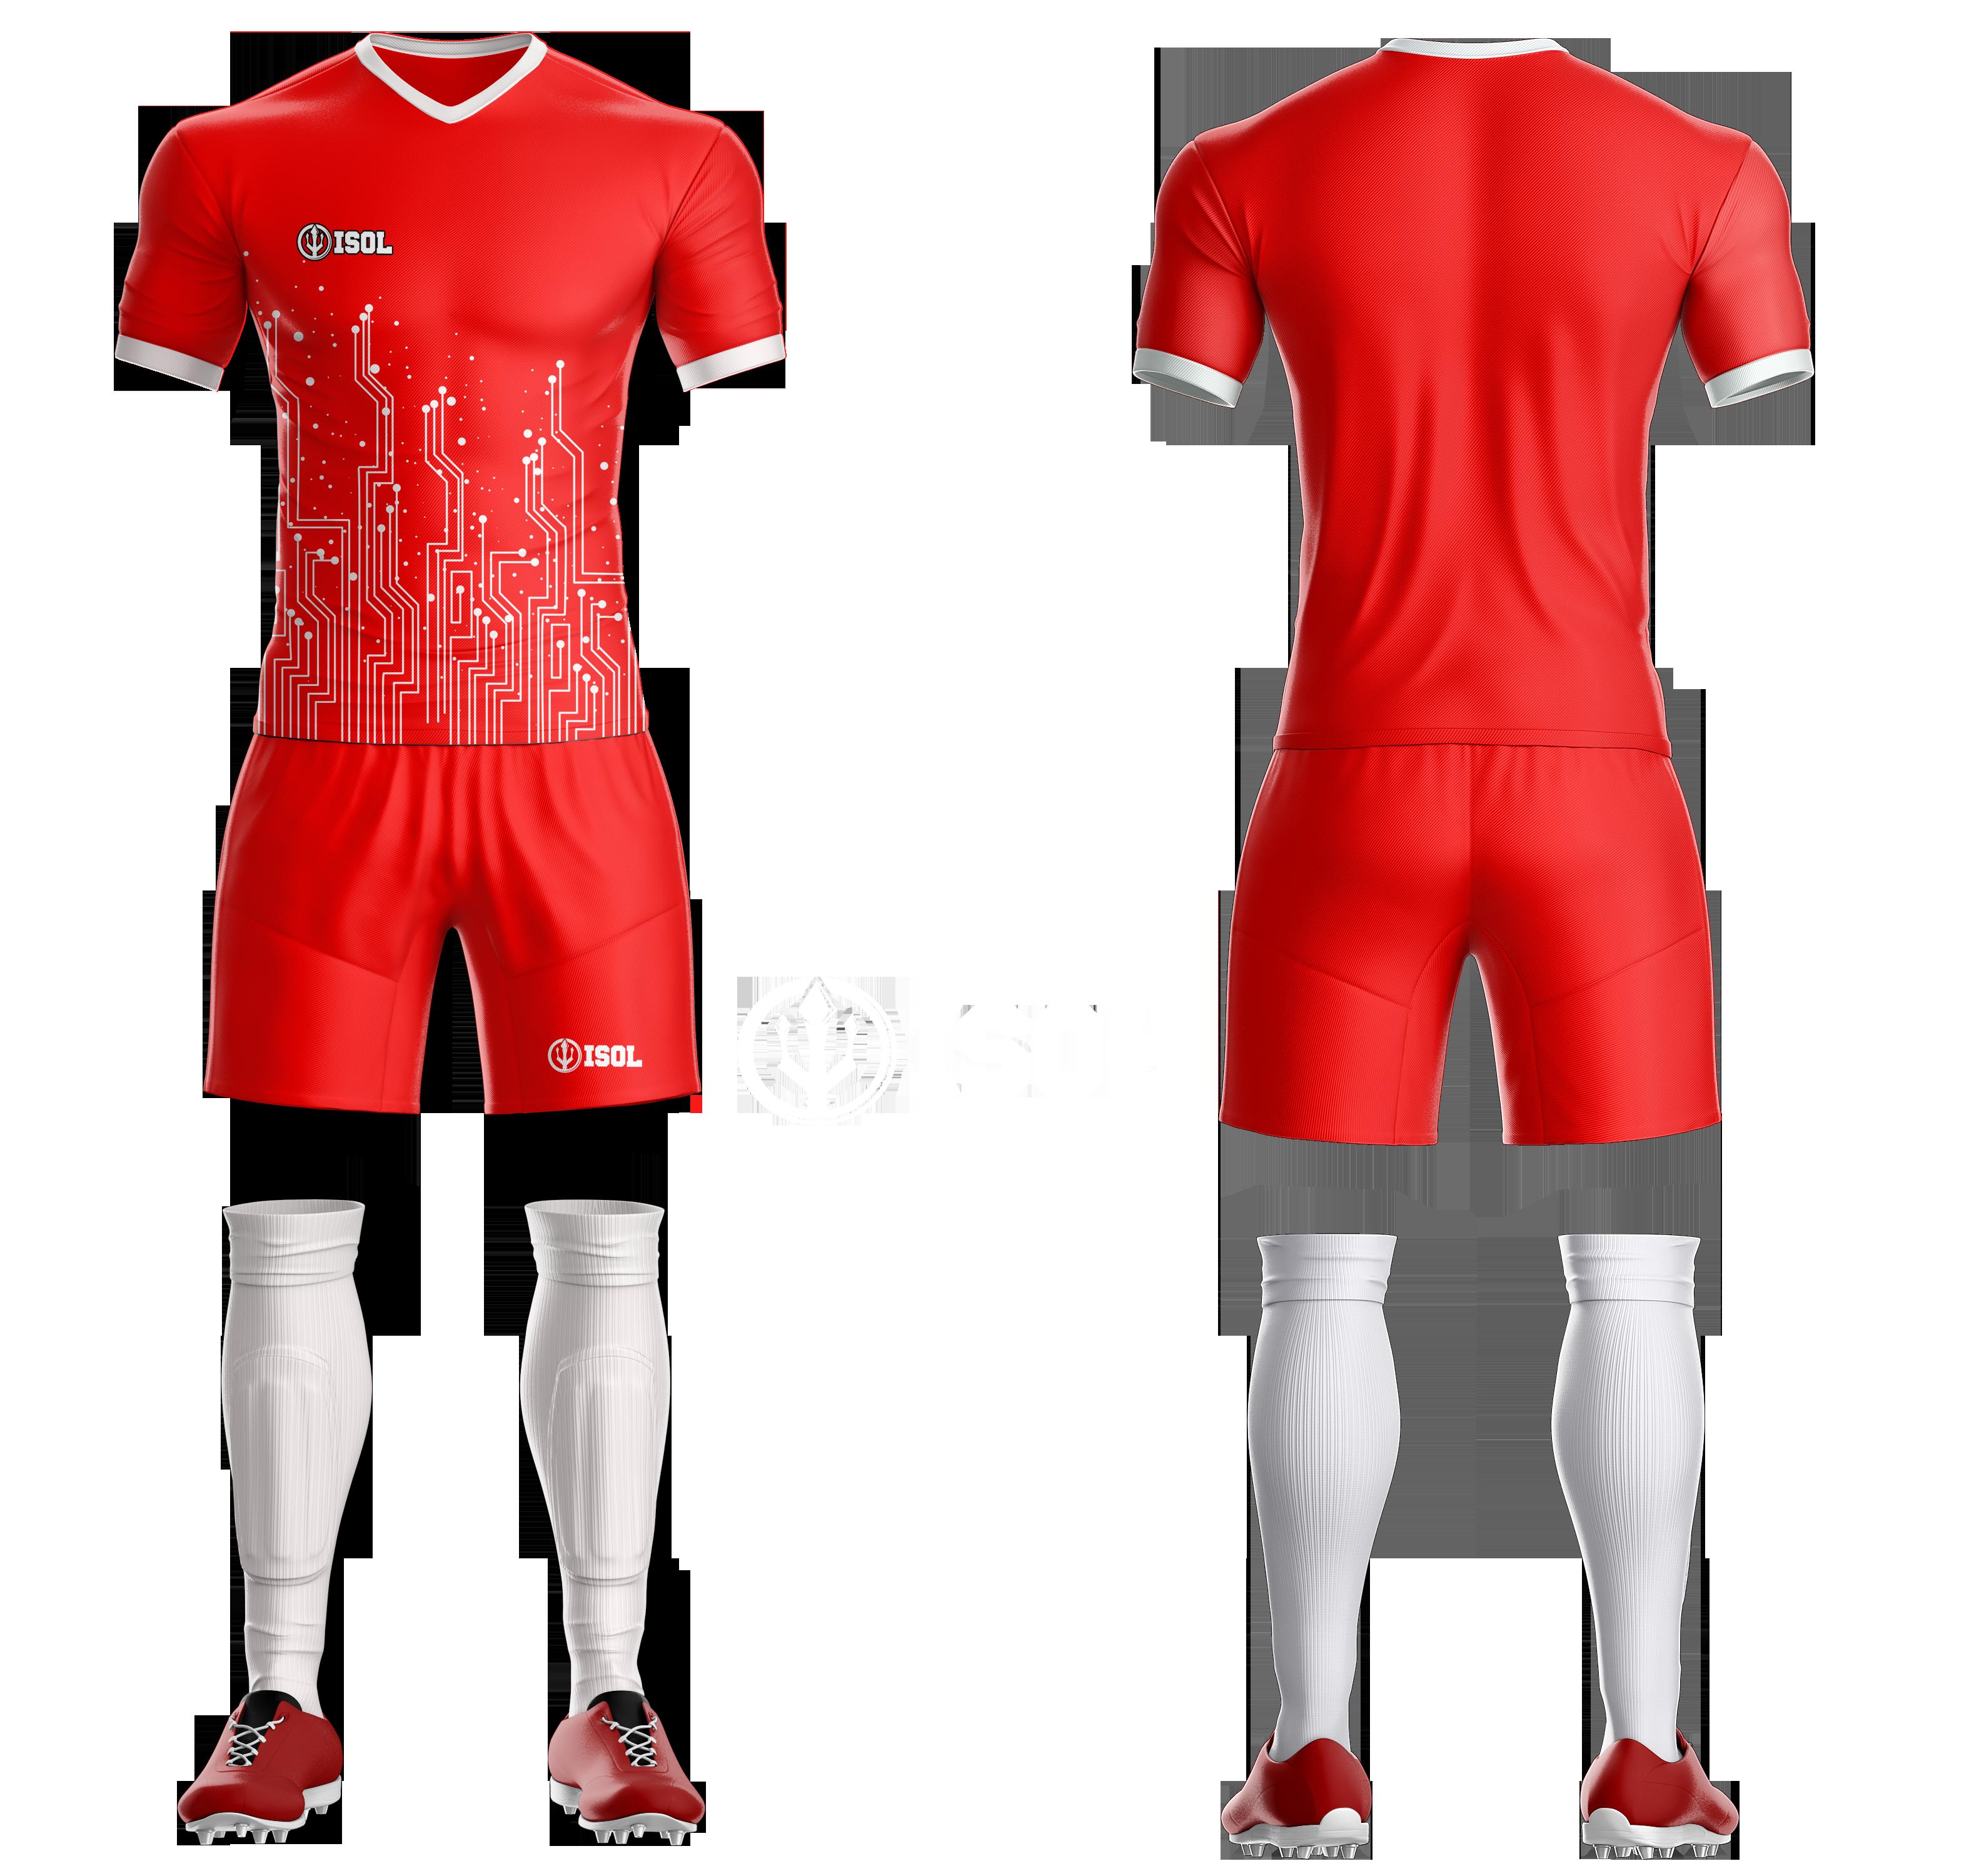 Desain Jersey Futsal Terbaik Printing Desain Jersey Sepak Bola Penyimpanan